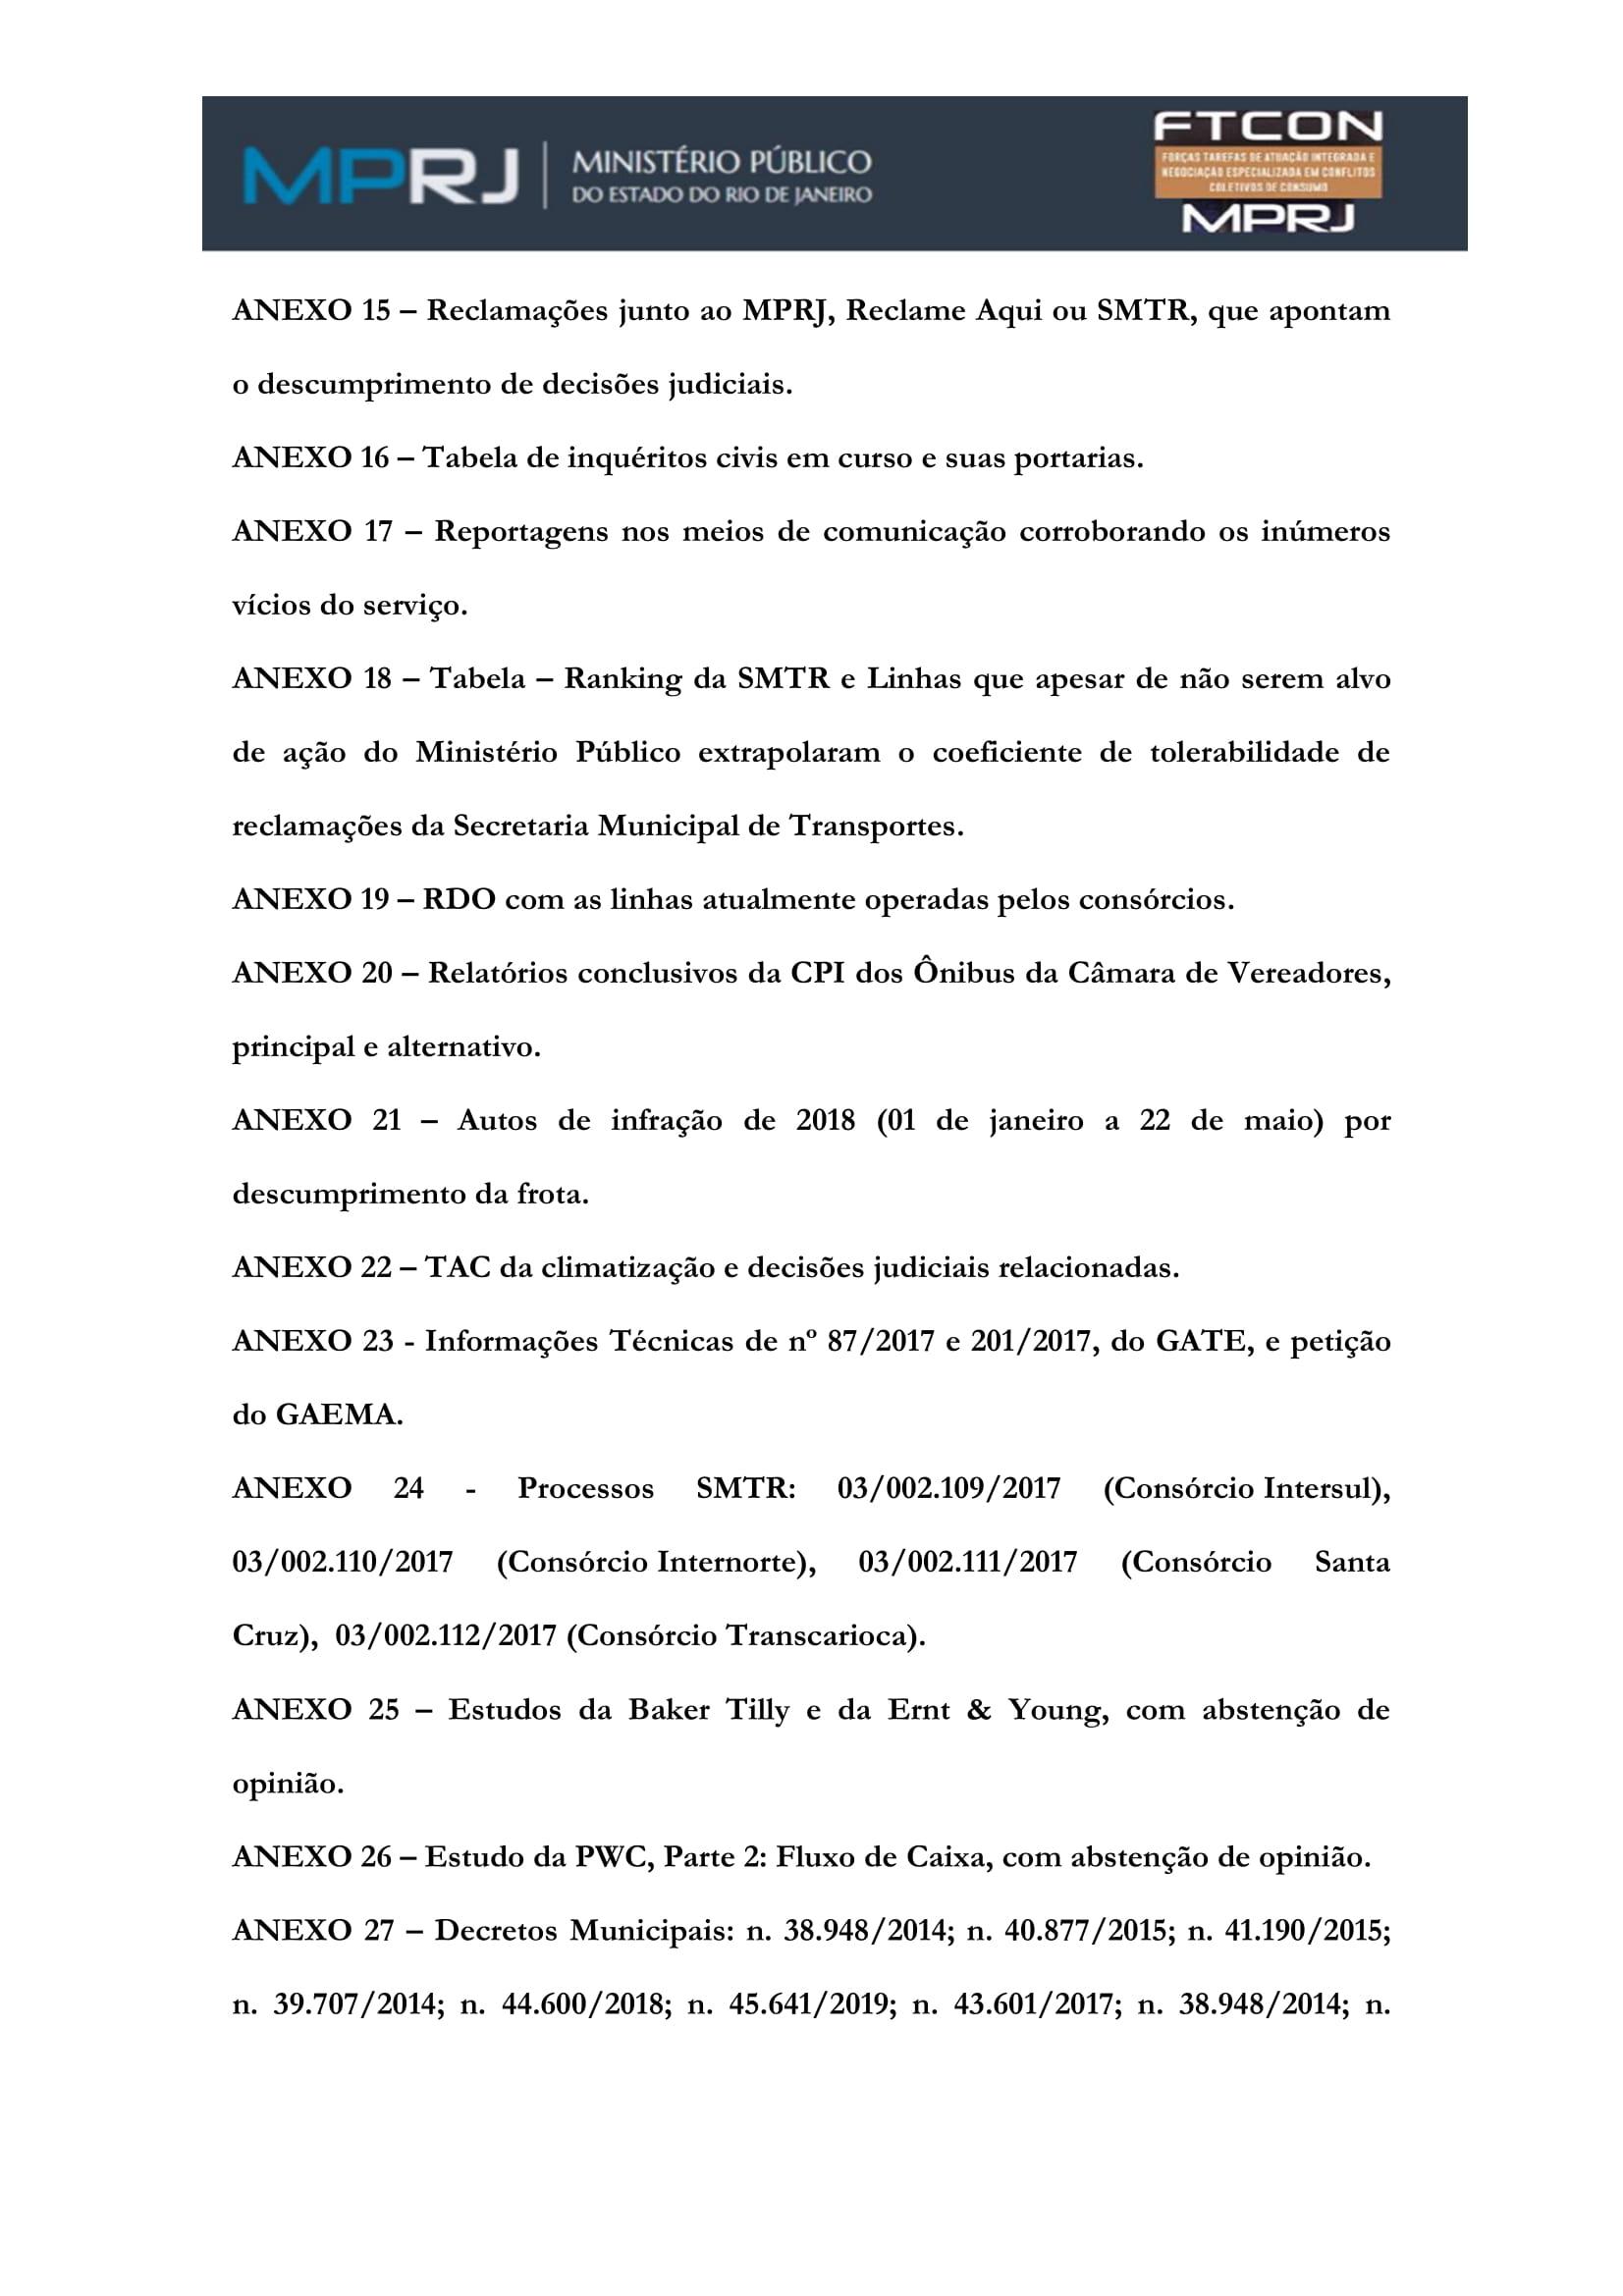 acp_caducidade_onibus_dr_rt-140